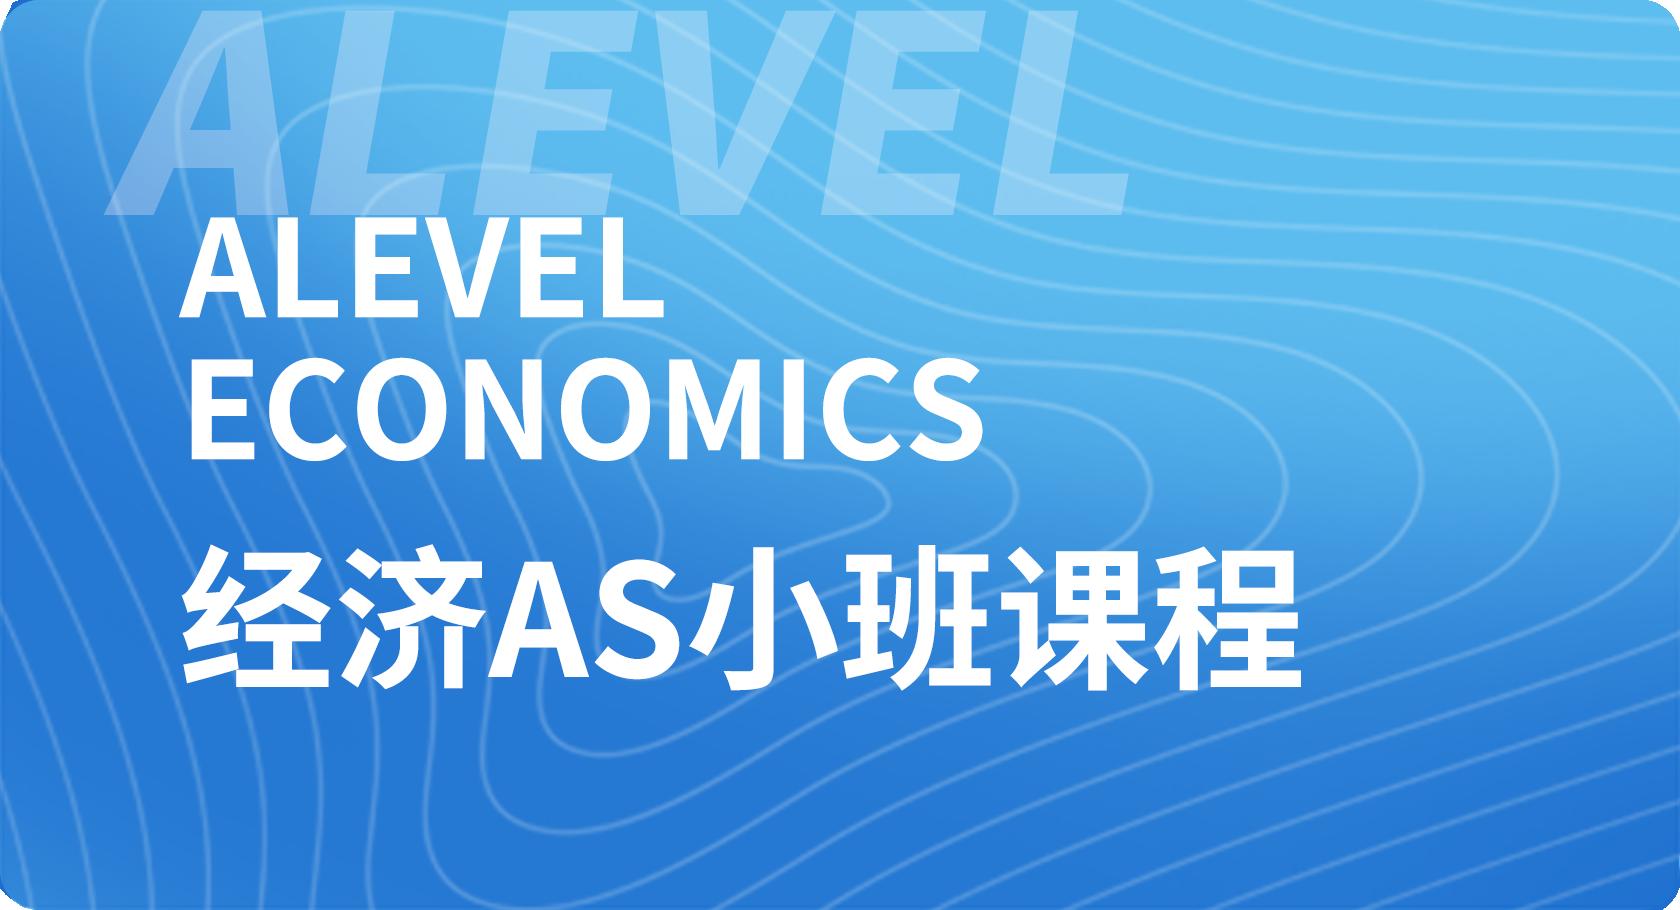 Alevel经济AS小班课程